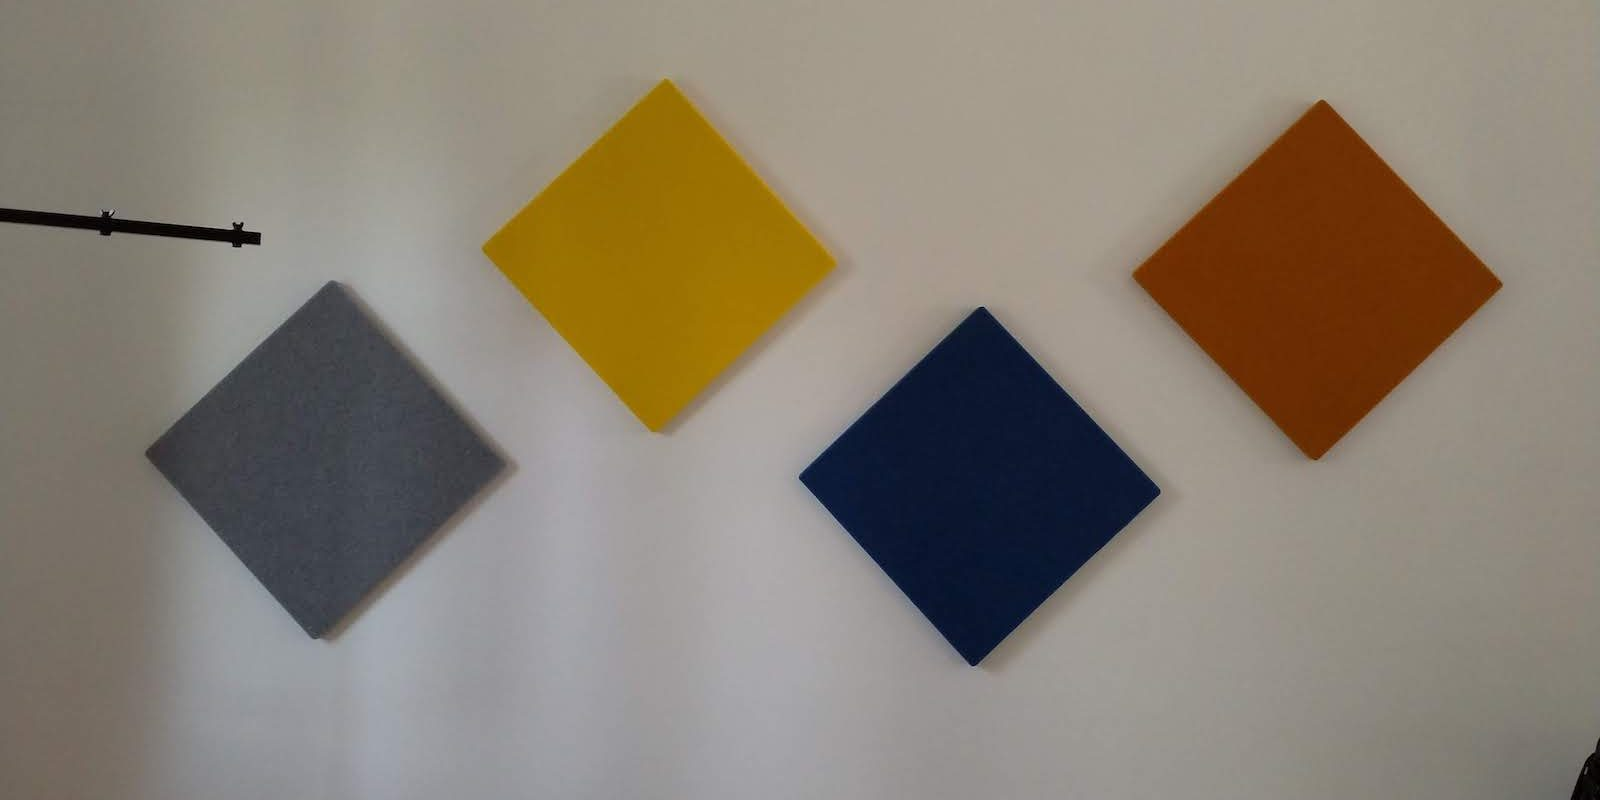 pannelli fonoassorbenti aula scolastica autex